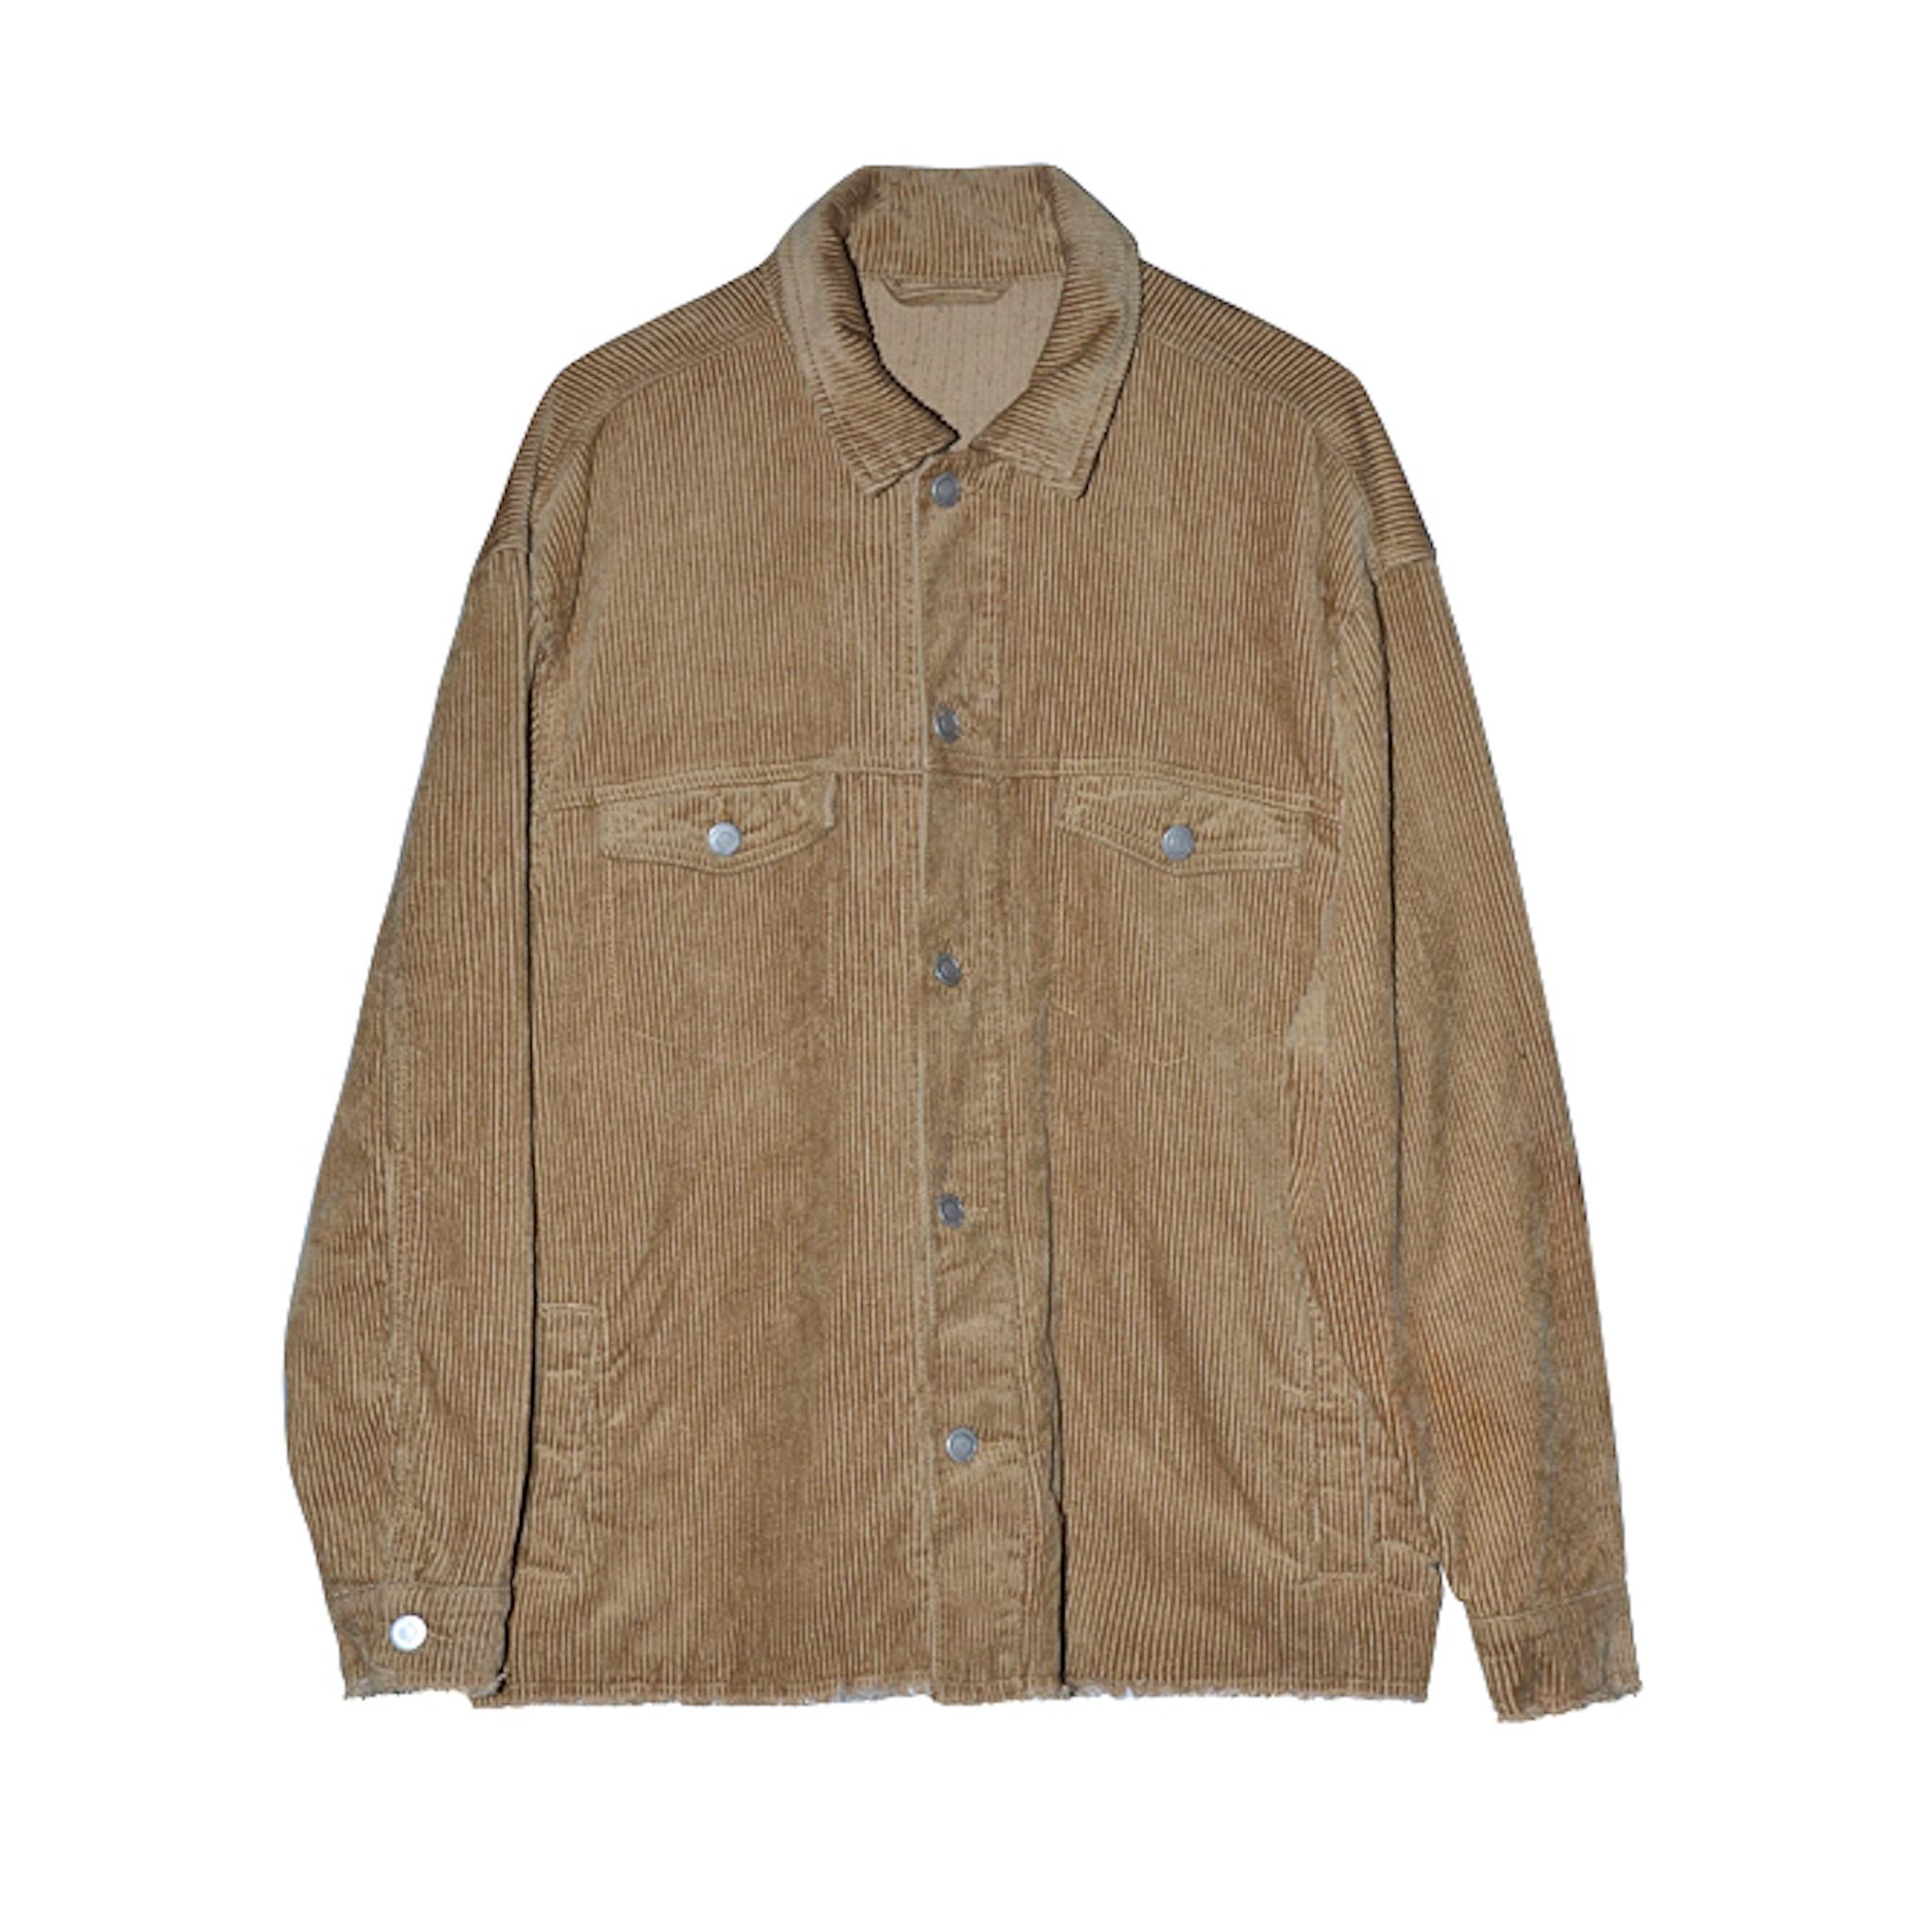 I dig denim - Wild Corduroy Shirt